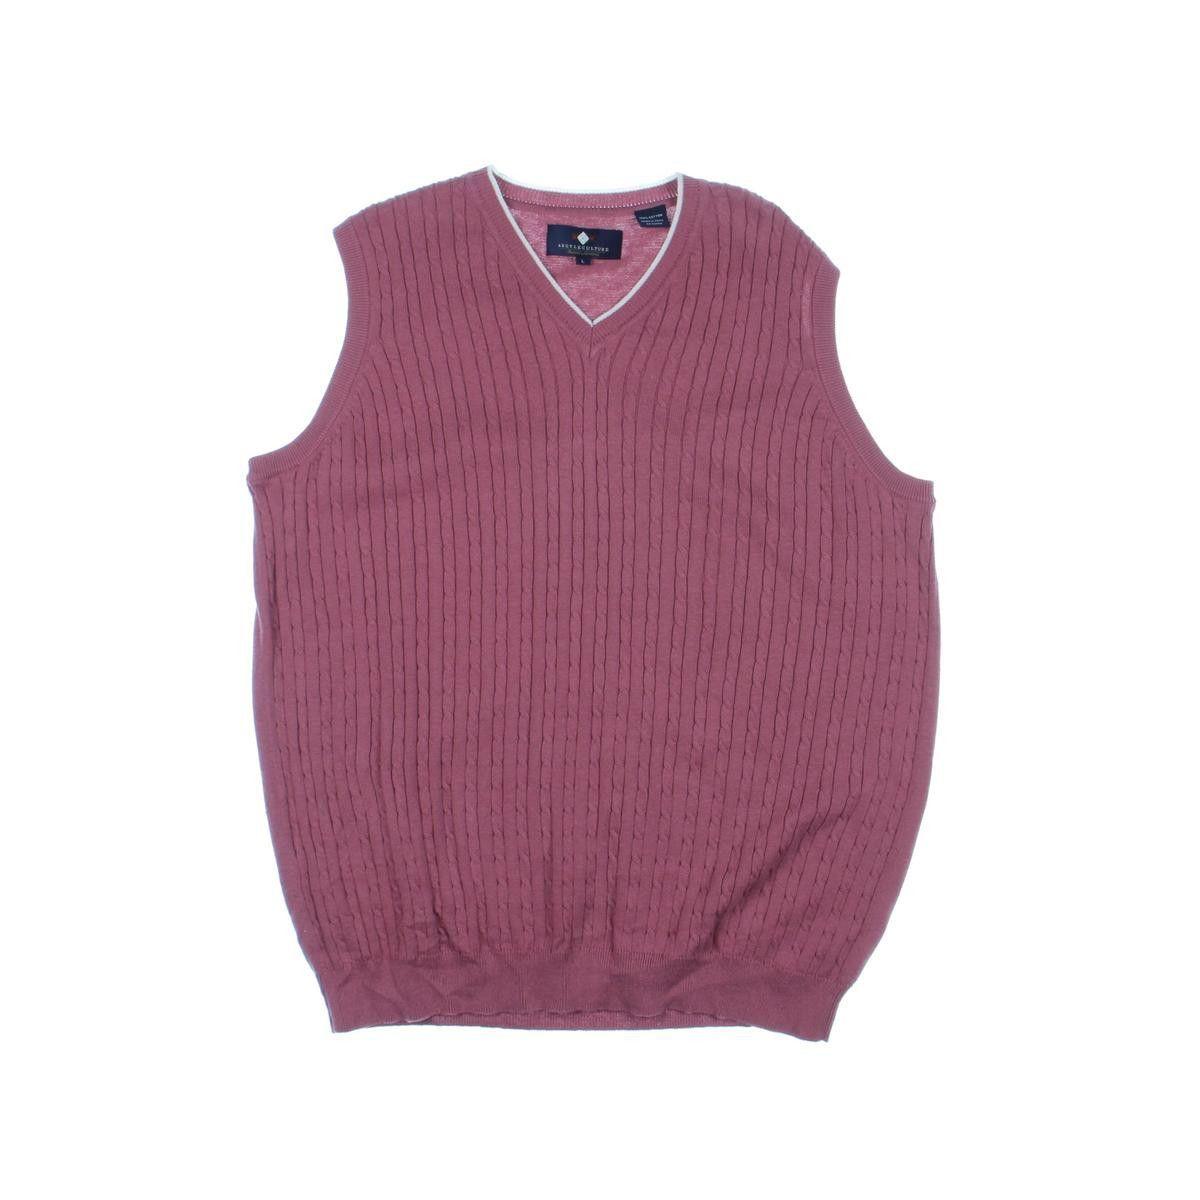 Argyle Culture Mens Cable Knit V-Neck Sweater Vest | Cardigans For ...